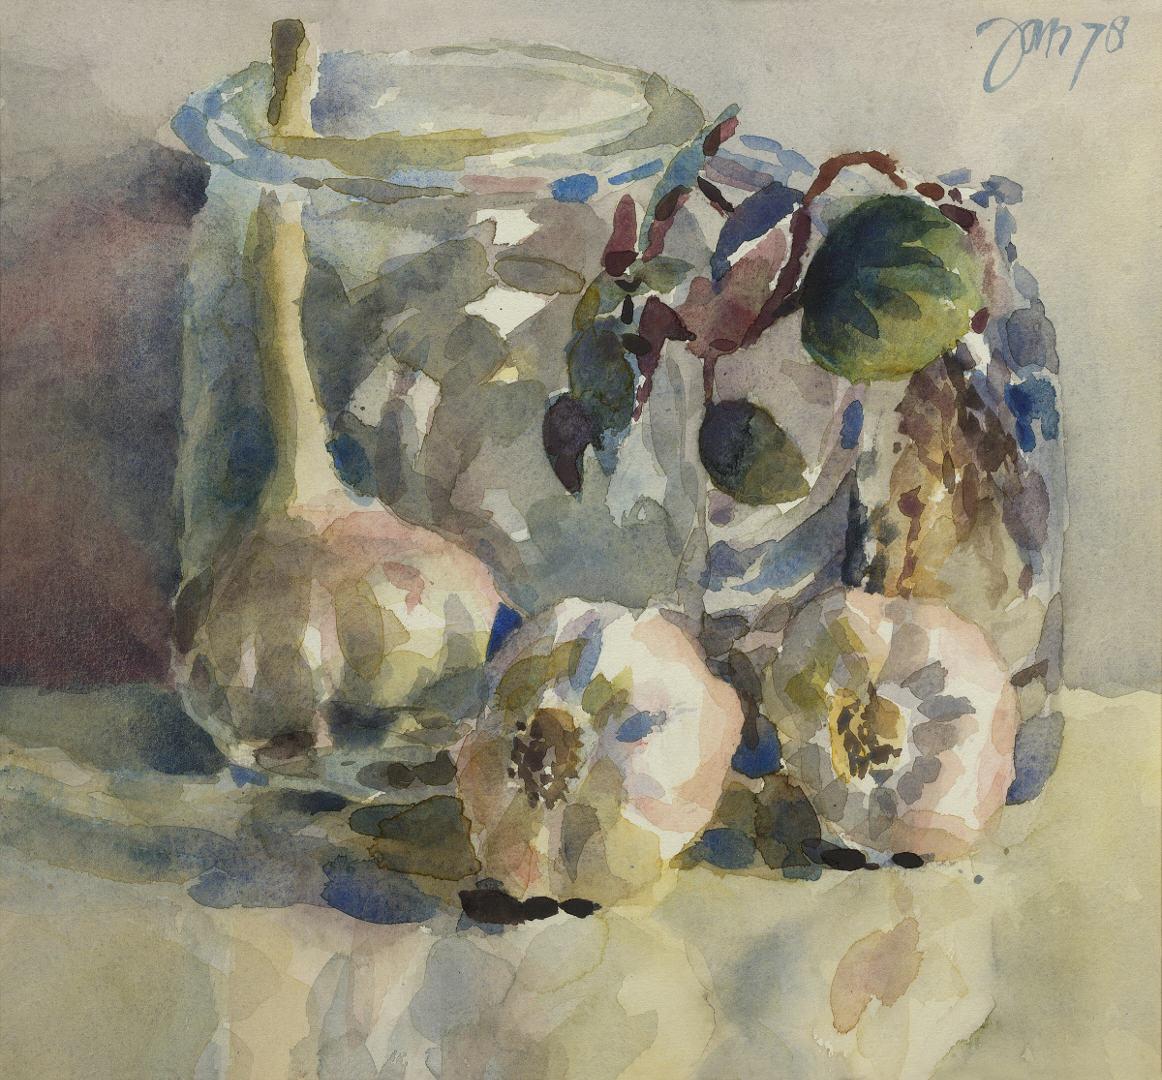 1978 Stilleven met knofloken (27 X 29 cm) 19040